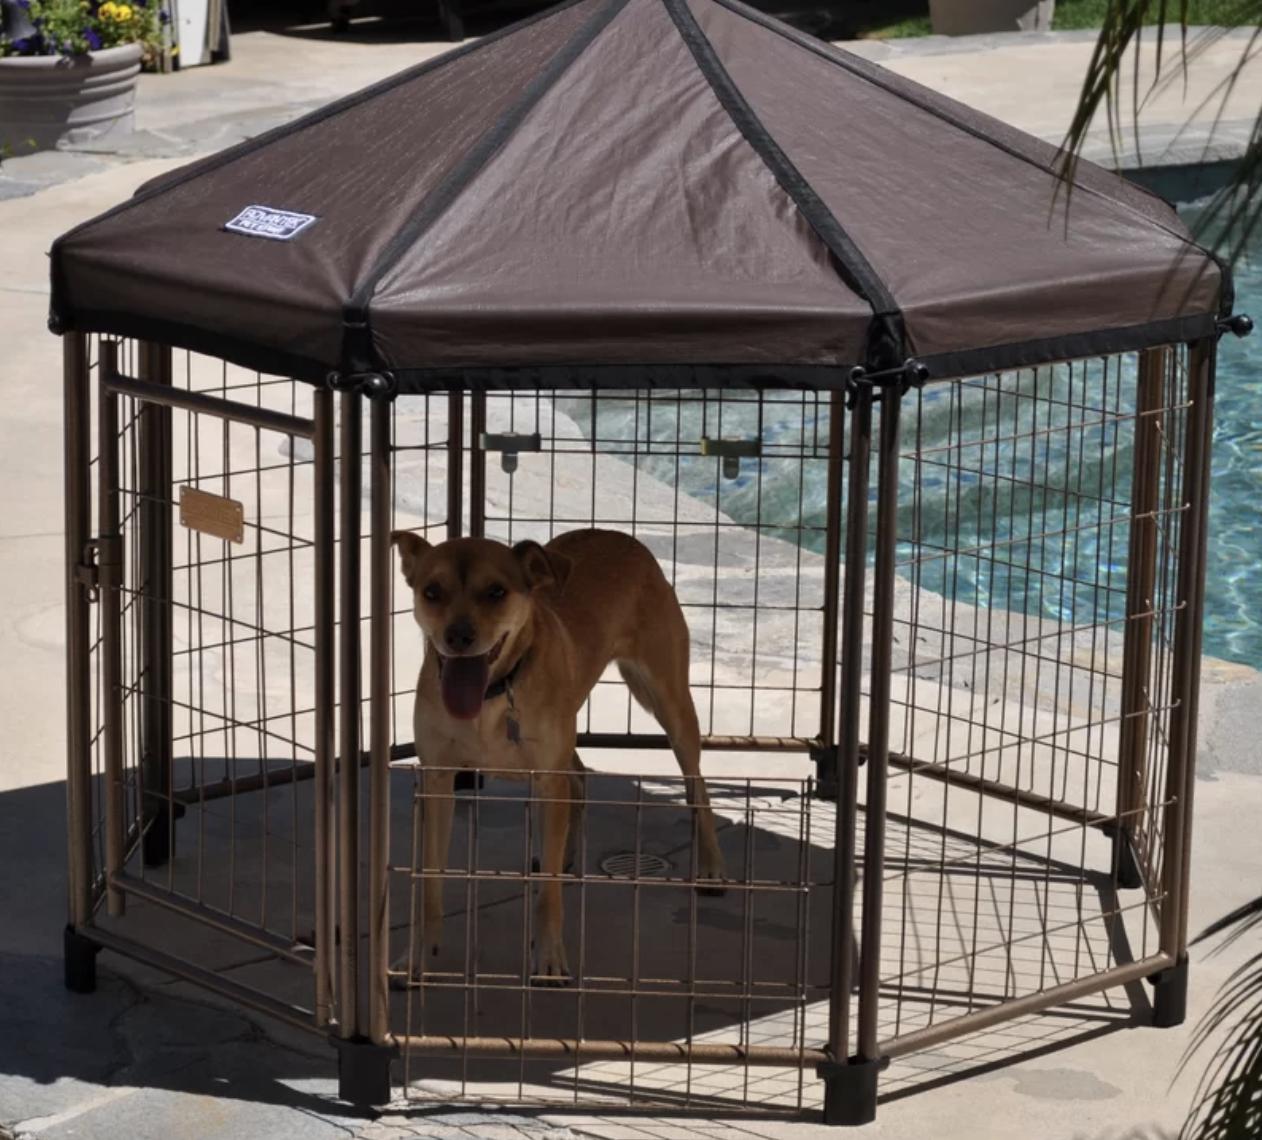 a dog in the gazebo kennel outside